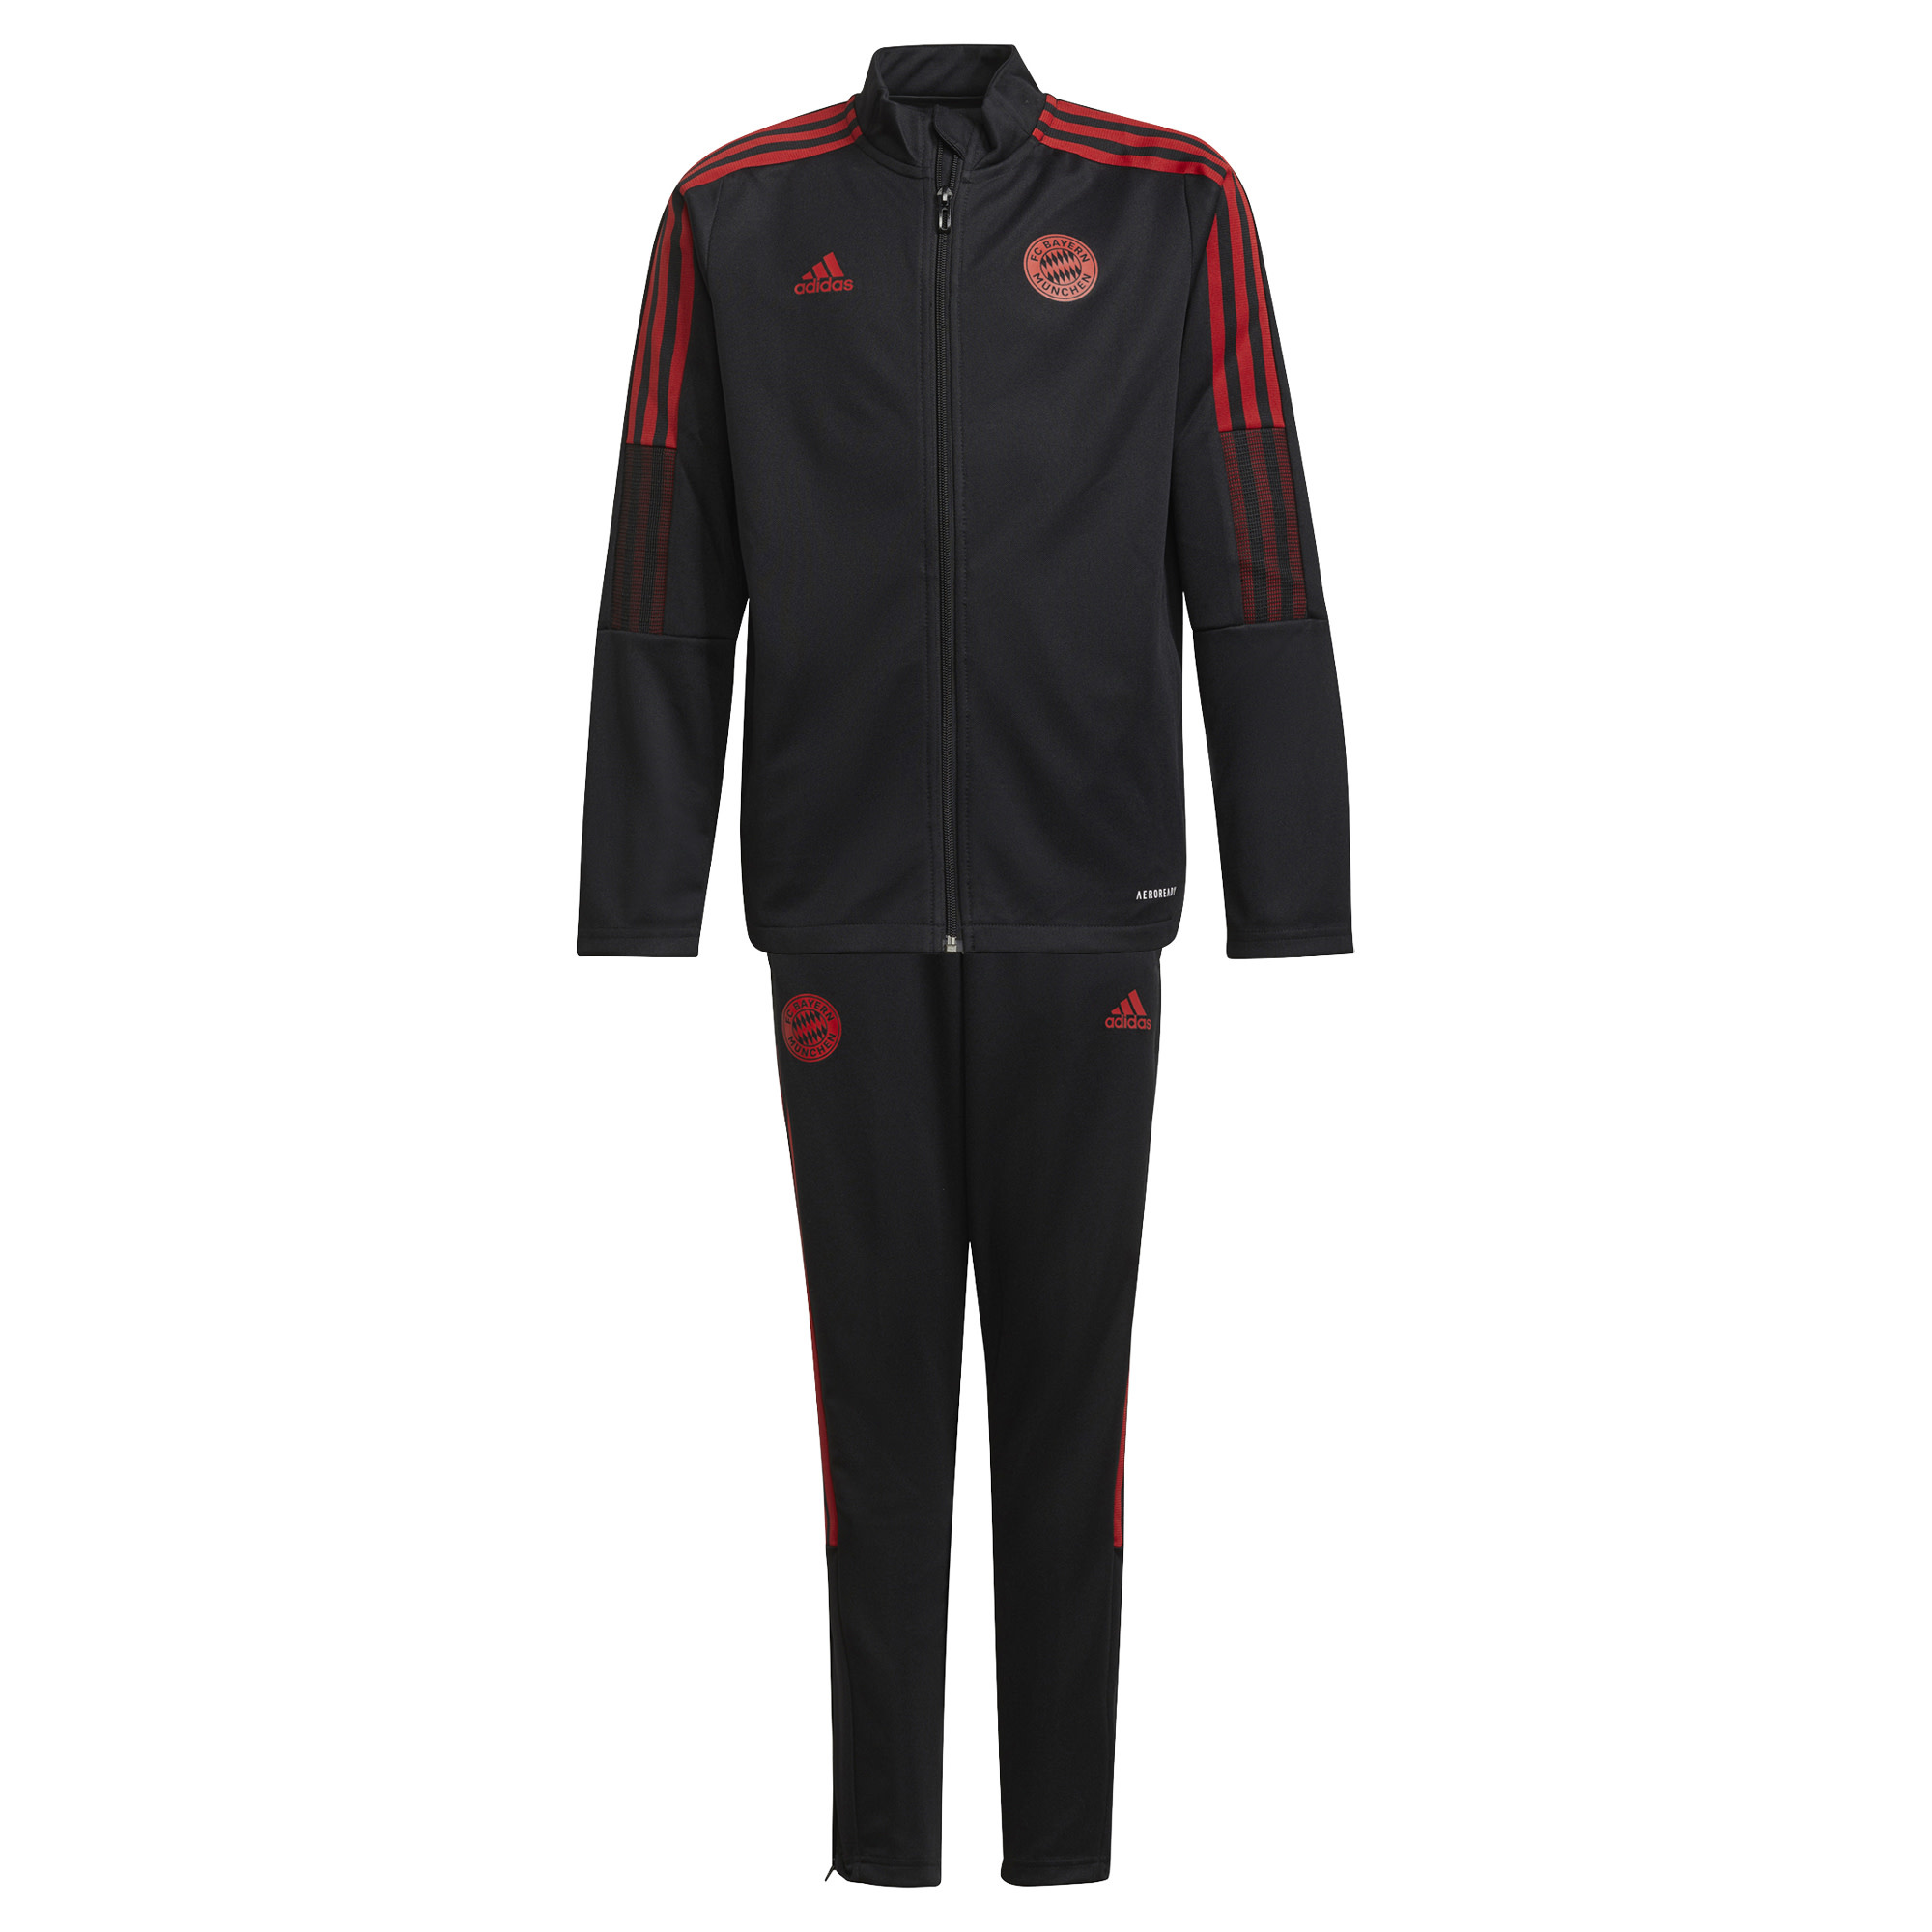 Adidas JR Bayern München Trainingspak